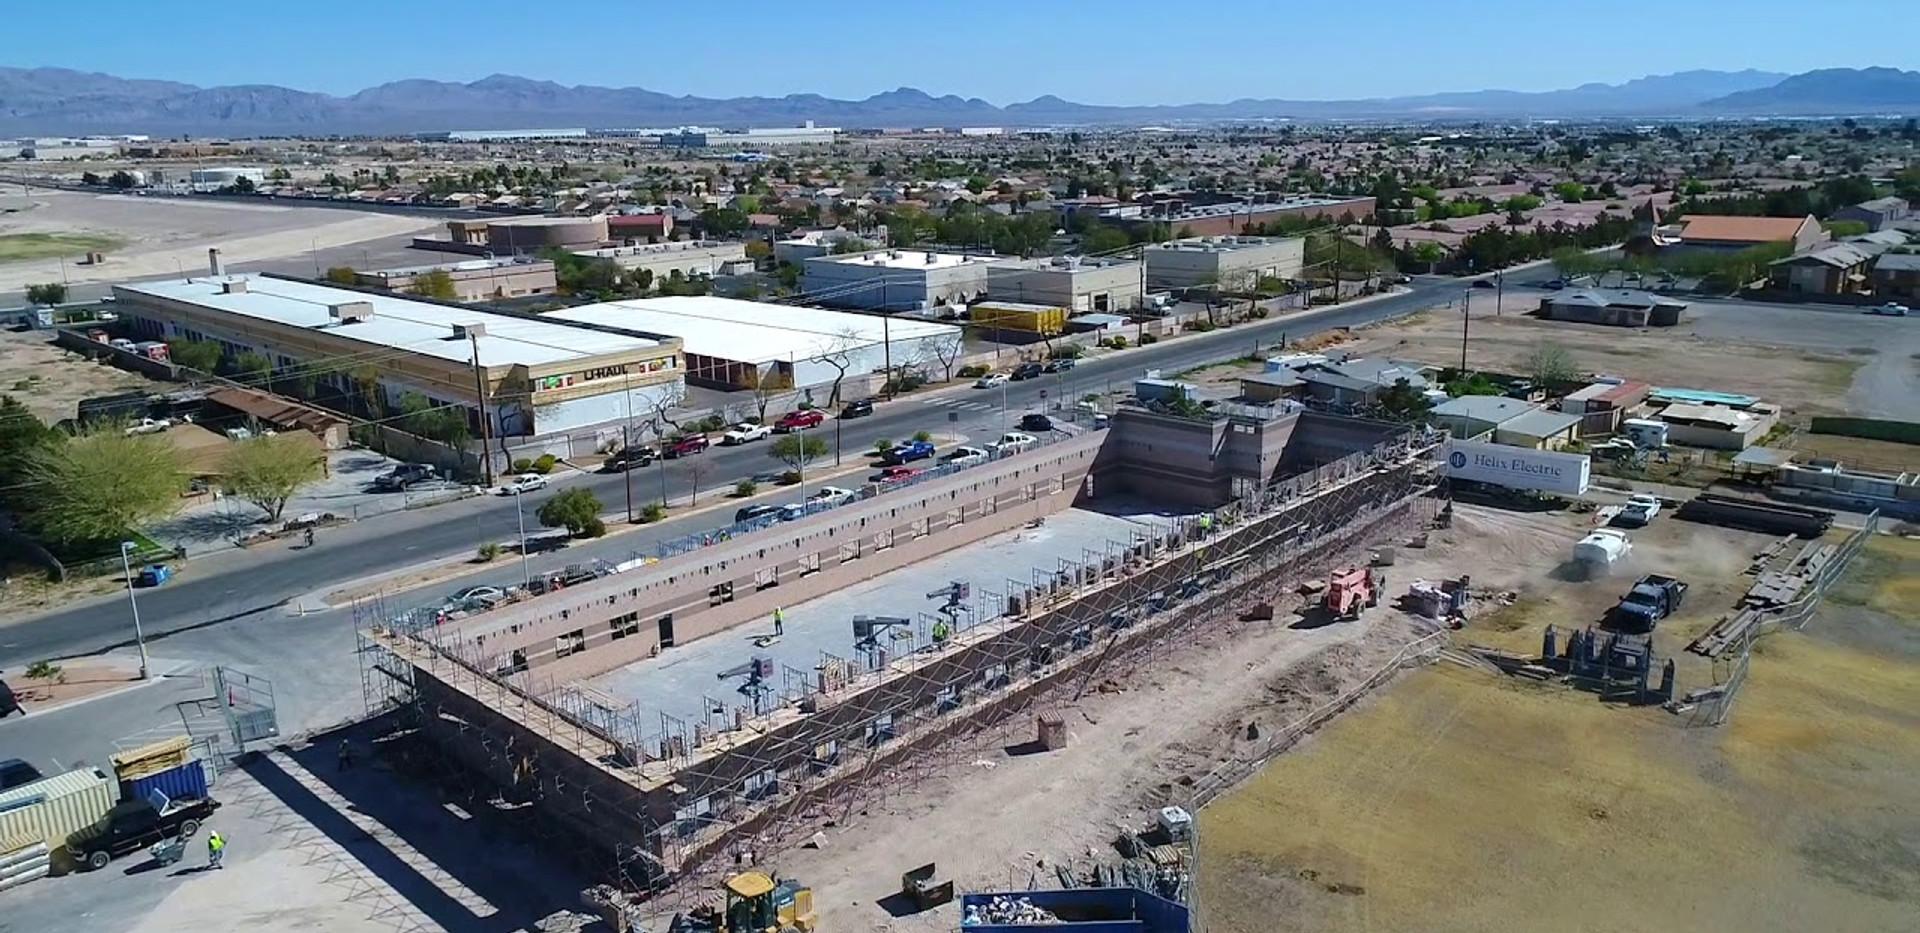 Detweiler Elementary School A-1 Masonry & Sandblasting, Nevada's Premier Masonry Contractor